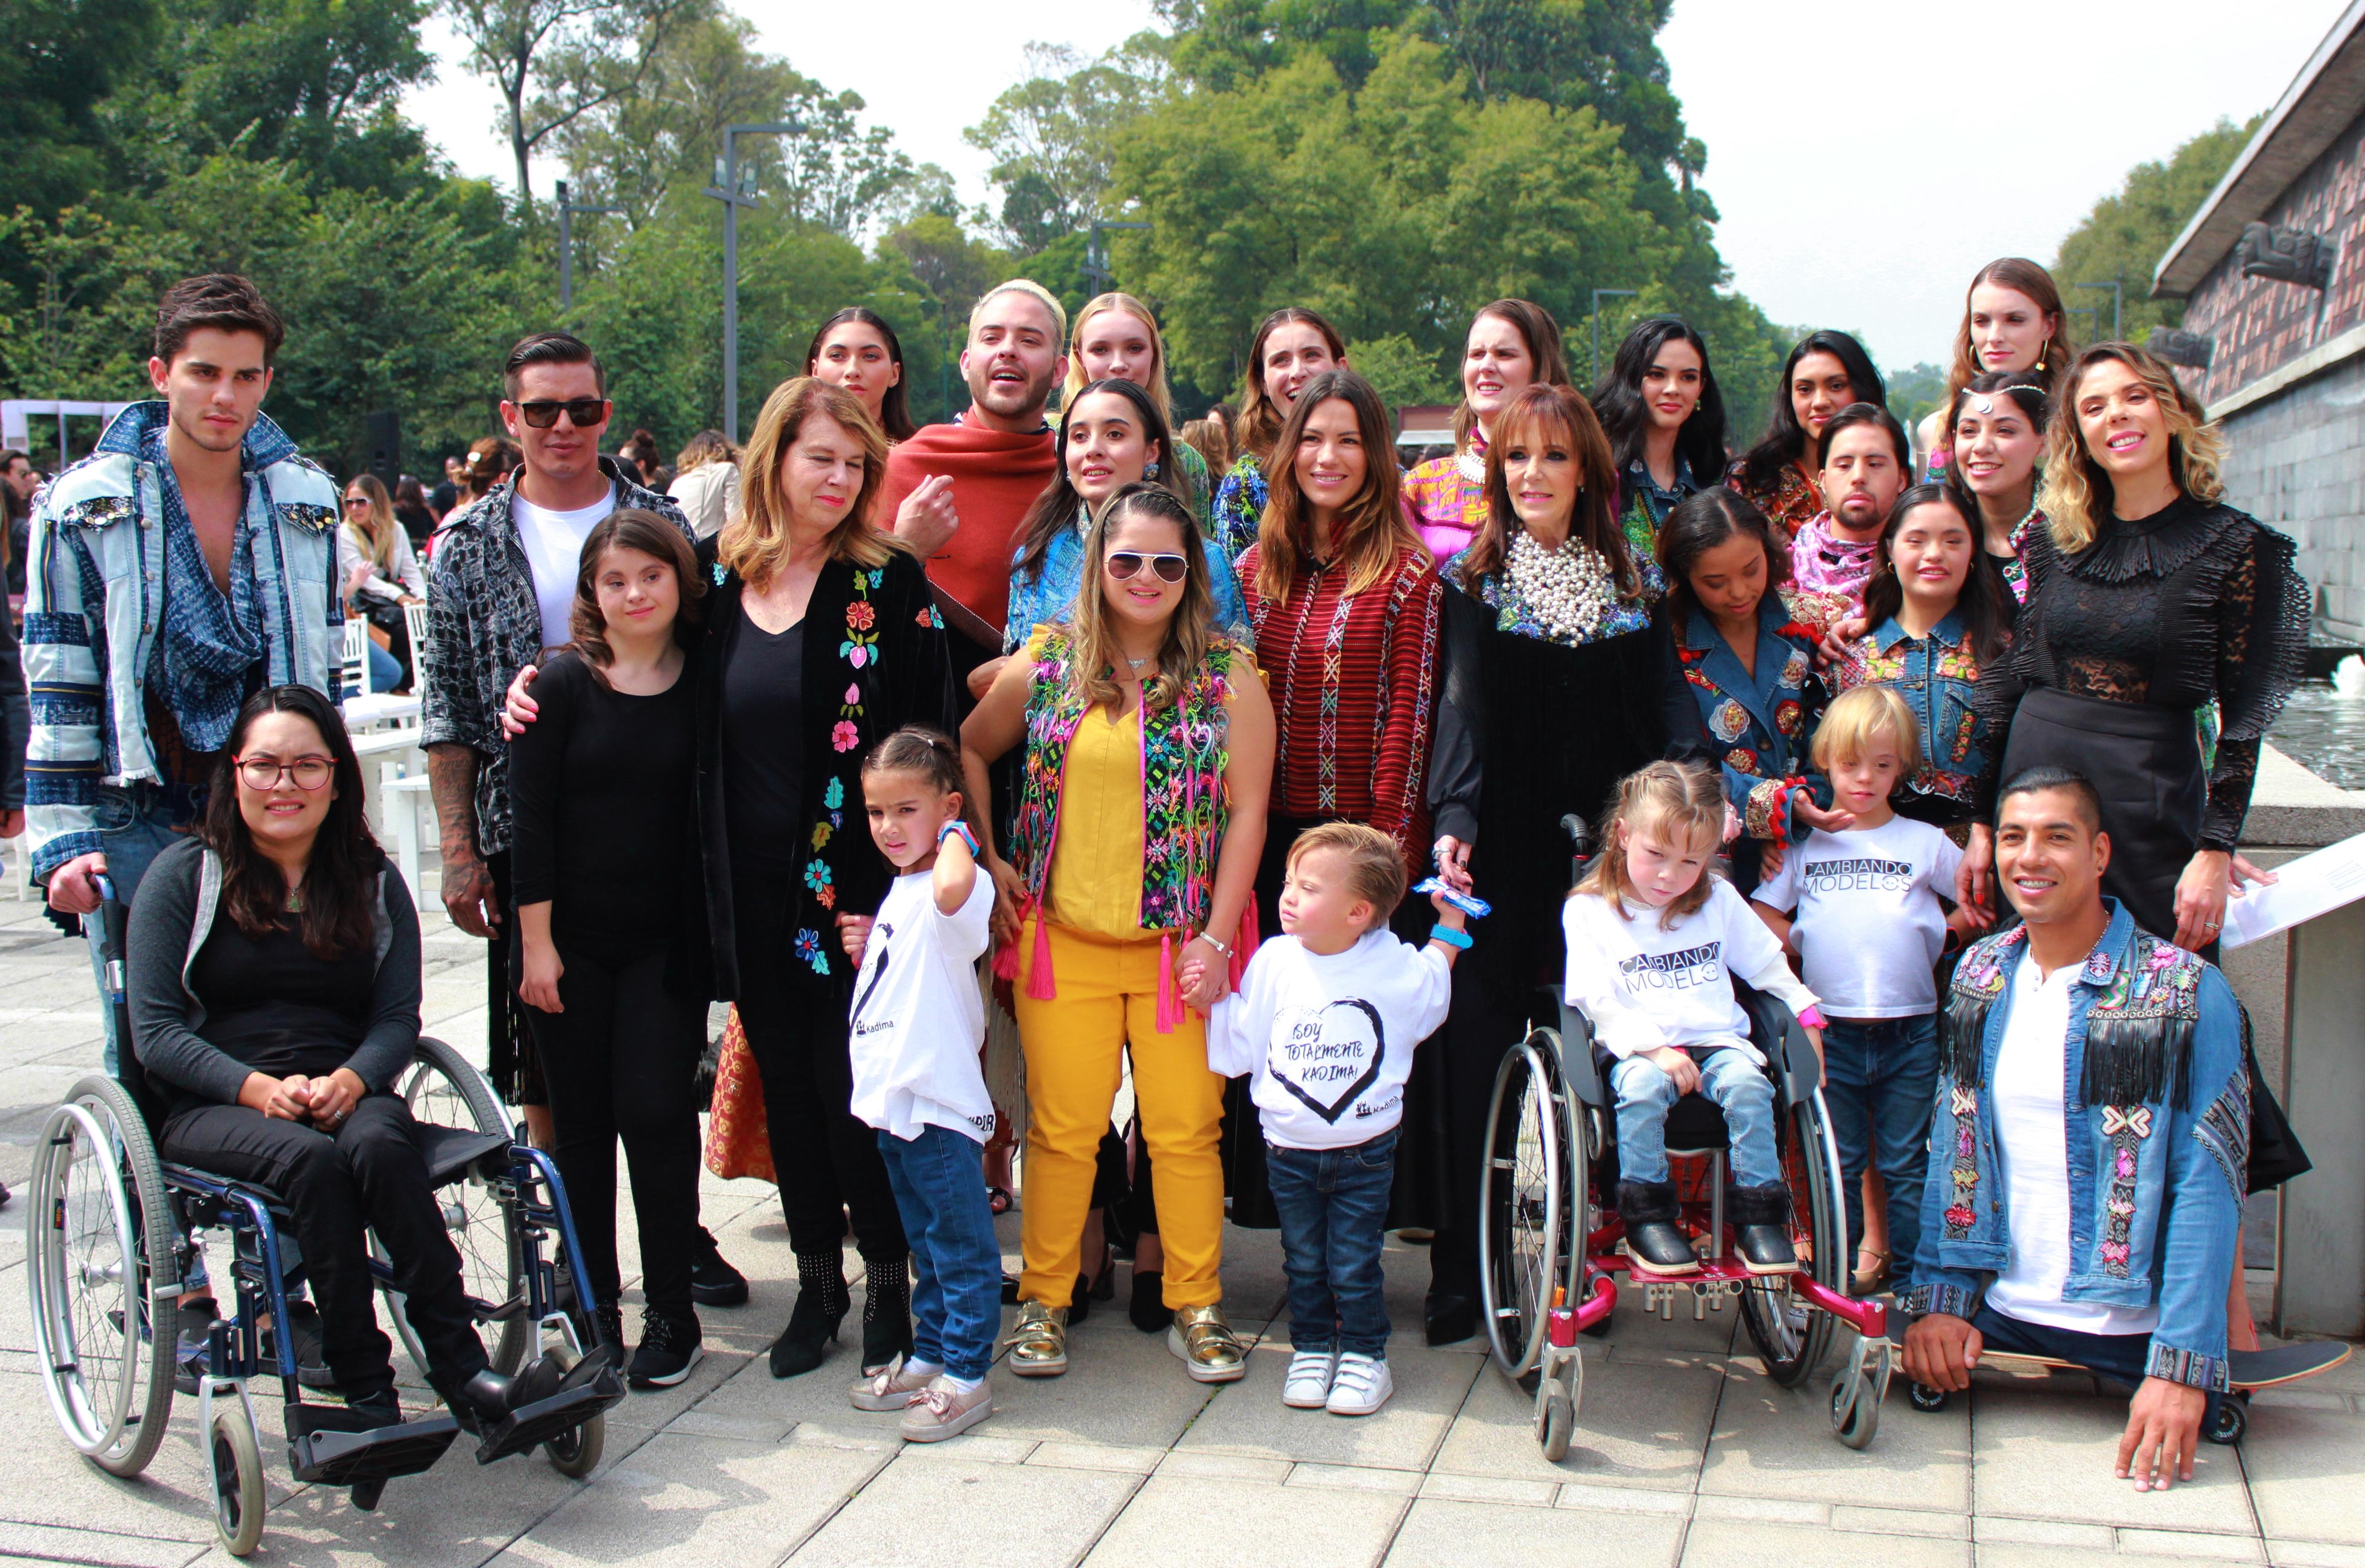 El All Inclusive Runway 2019 se realizó en el Bosque de Chapultepec en la Ciudad de México (Foto: Martín Avilés)